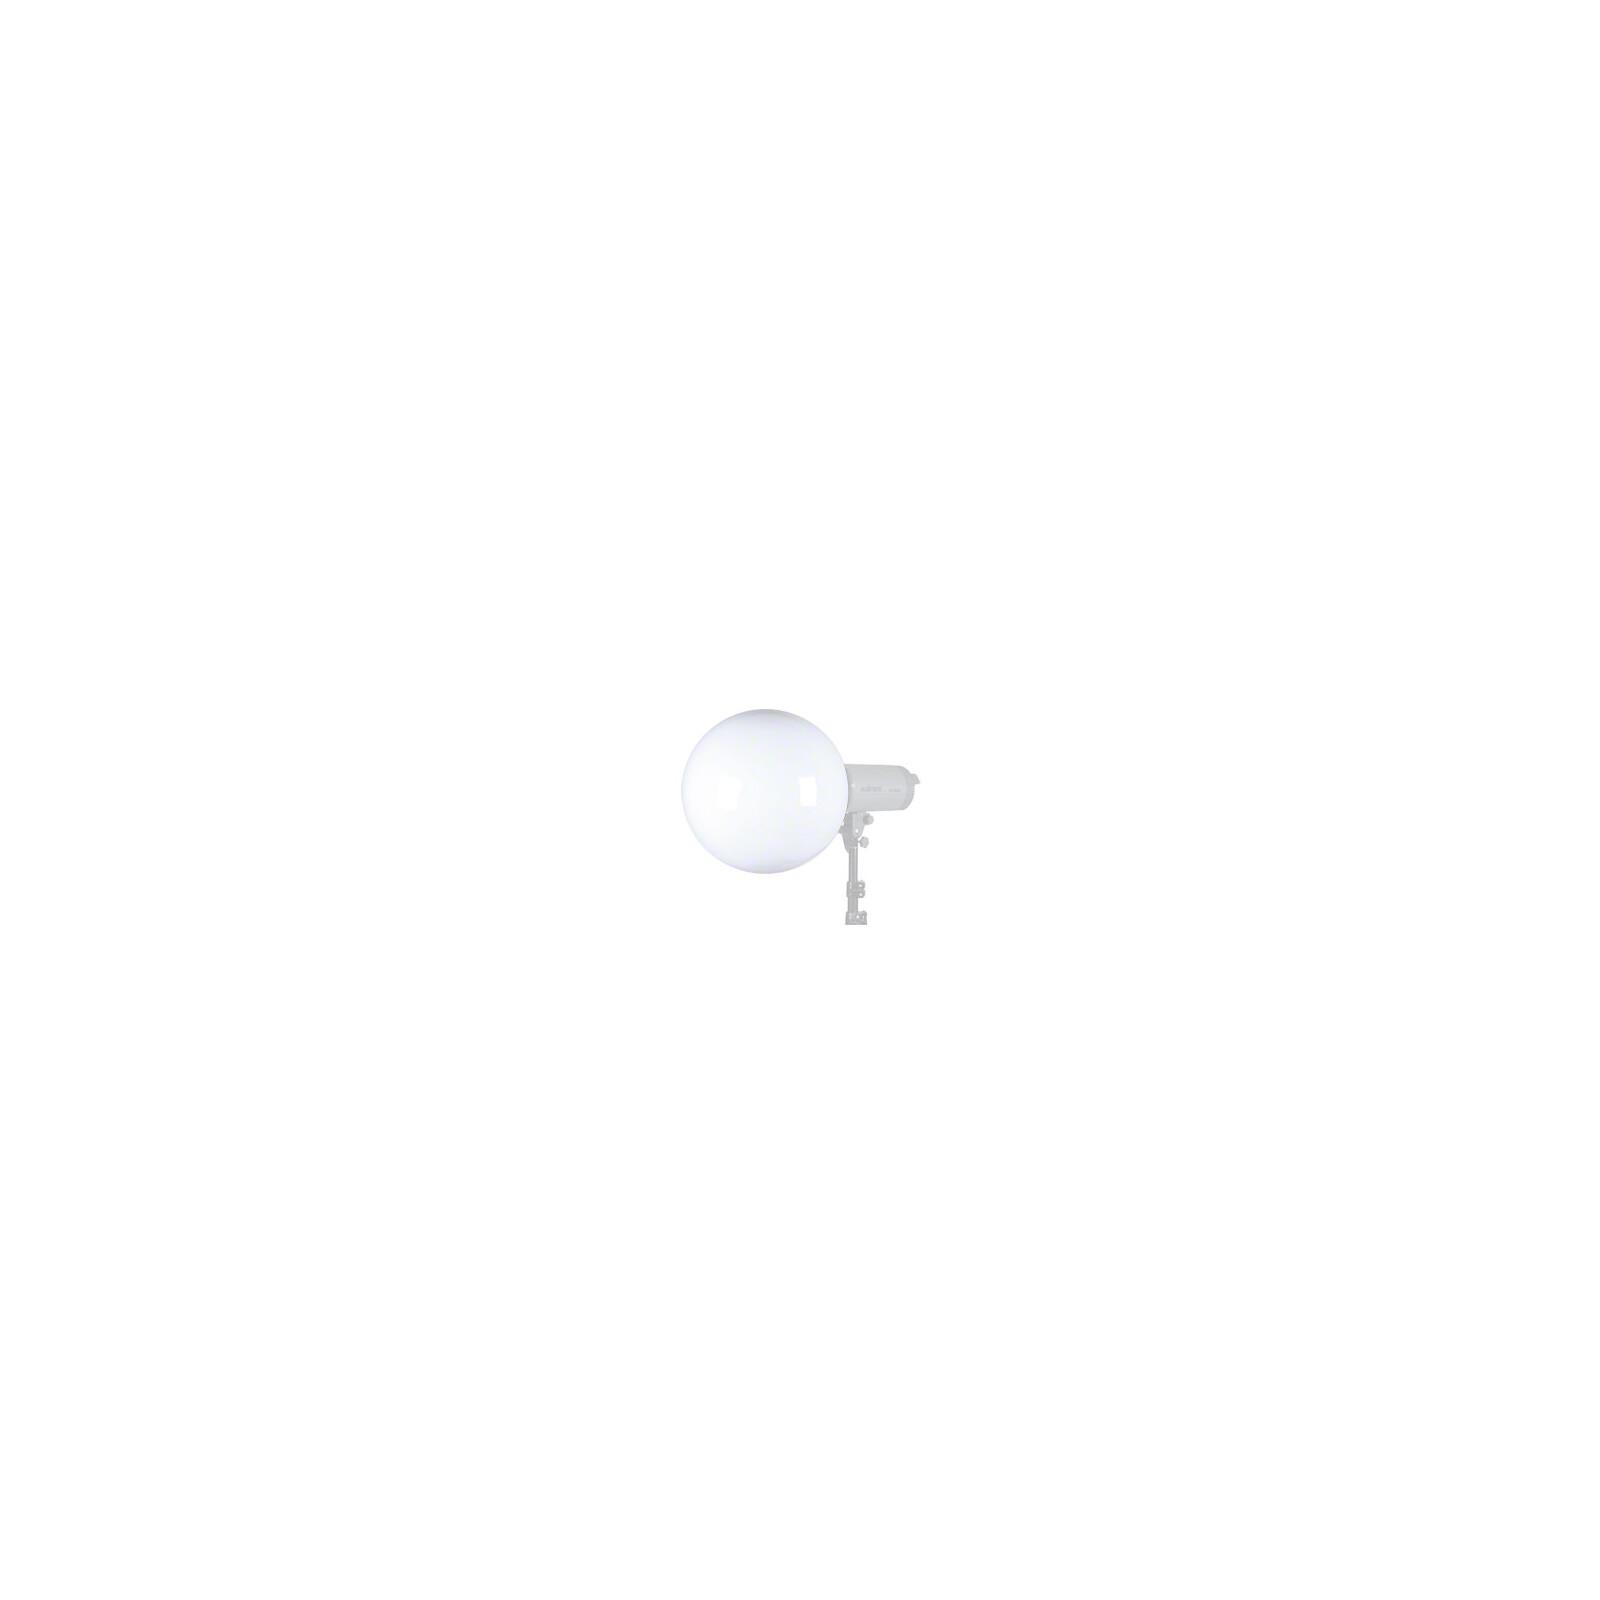 walimex Univ. Diffusorkugel, 30cm Visatec